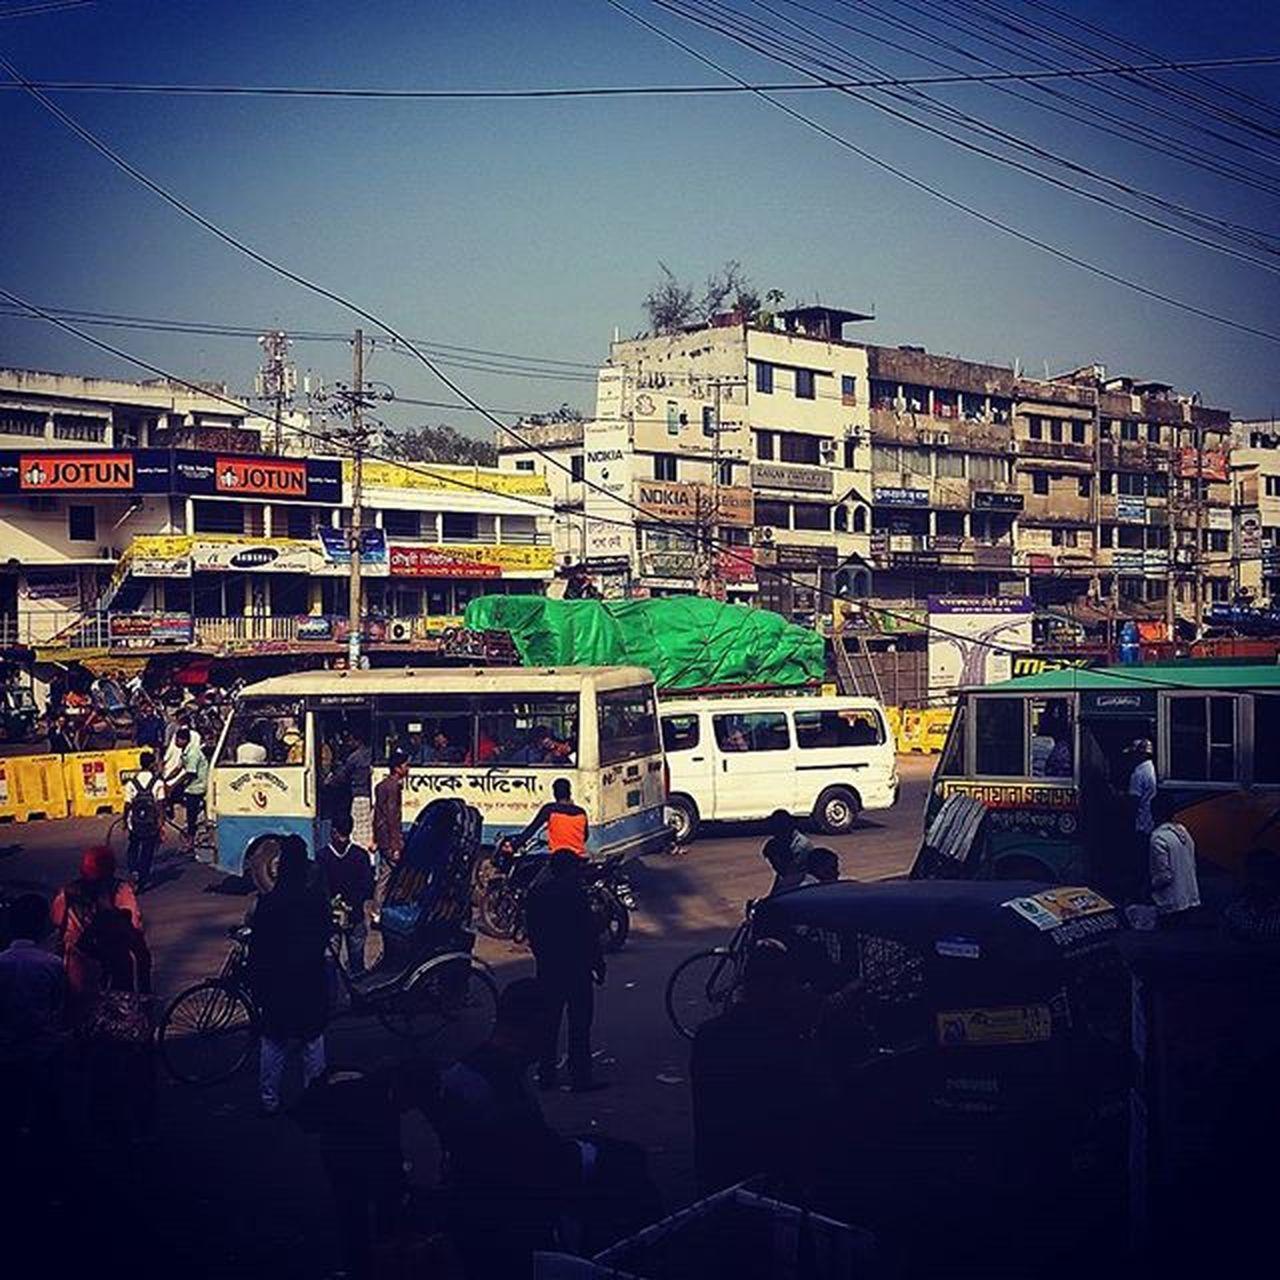 Loveyouchittagong Myheartisyours Bangladesh Chittagong CityOfColor ,crowd&love Eyeemchittagong FreelanceLife Homeishere Homie MemoryLane